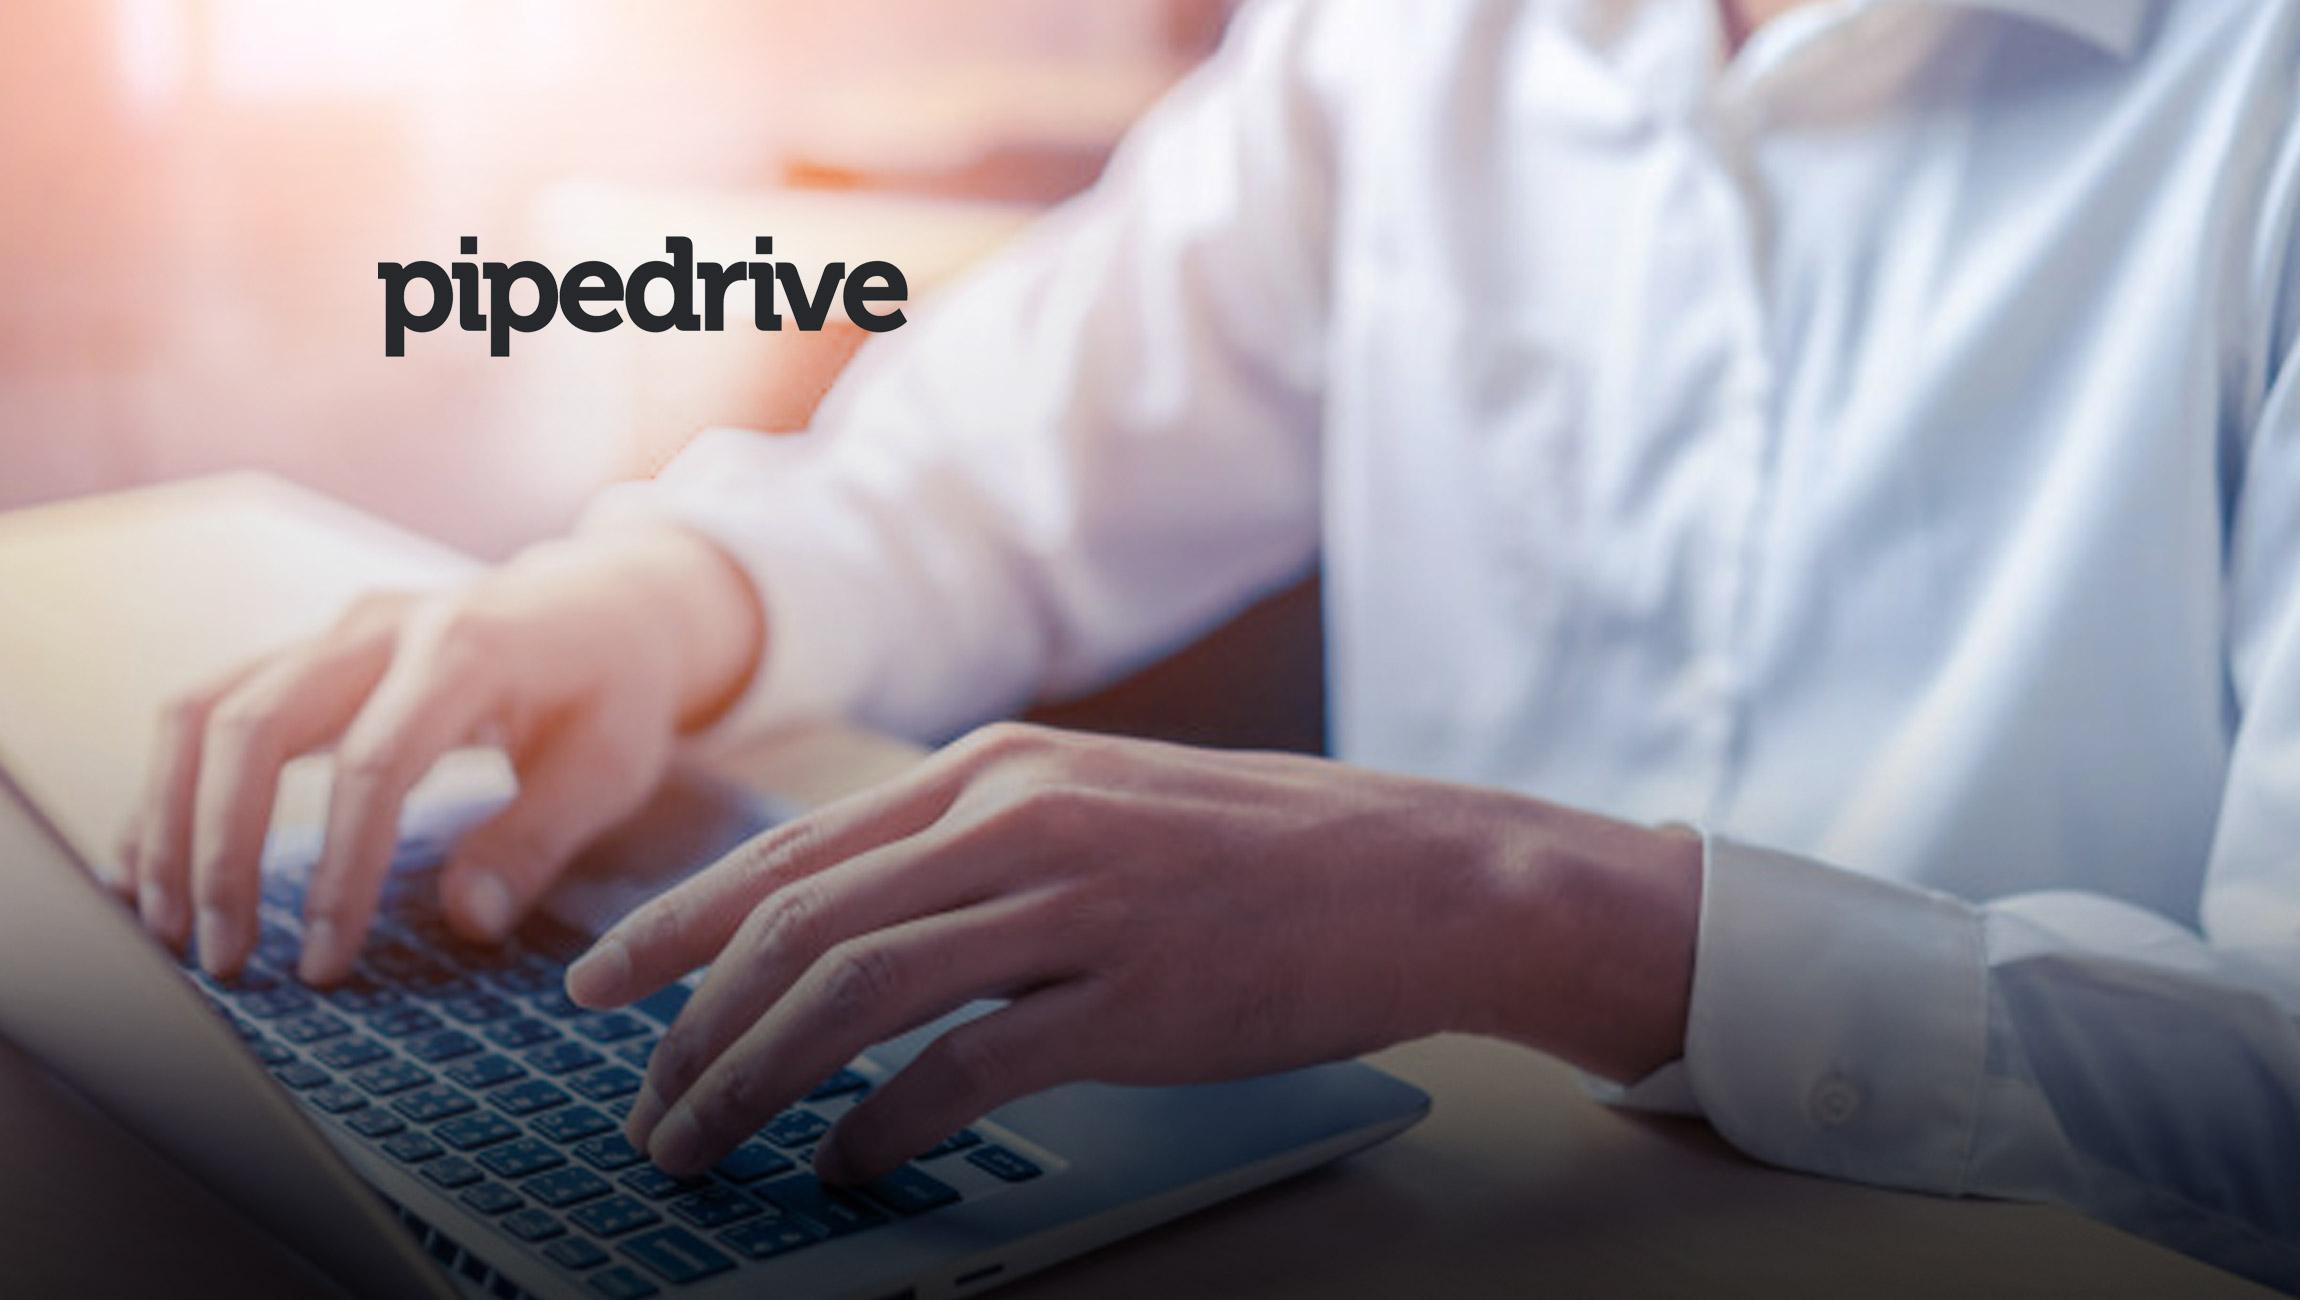 Pipedrive Appoints Industry Veteran Raj Sabhlok as CEO